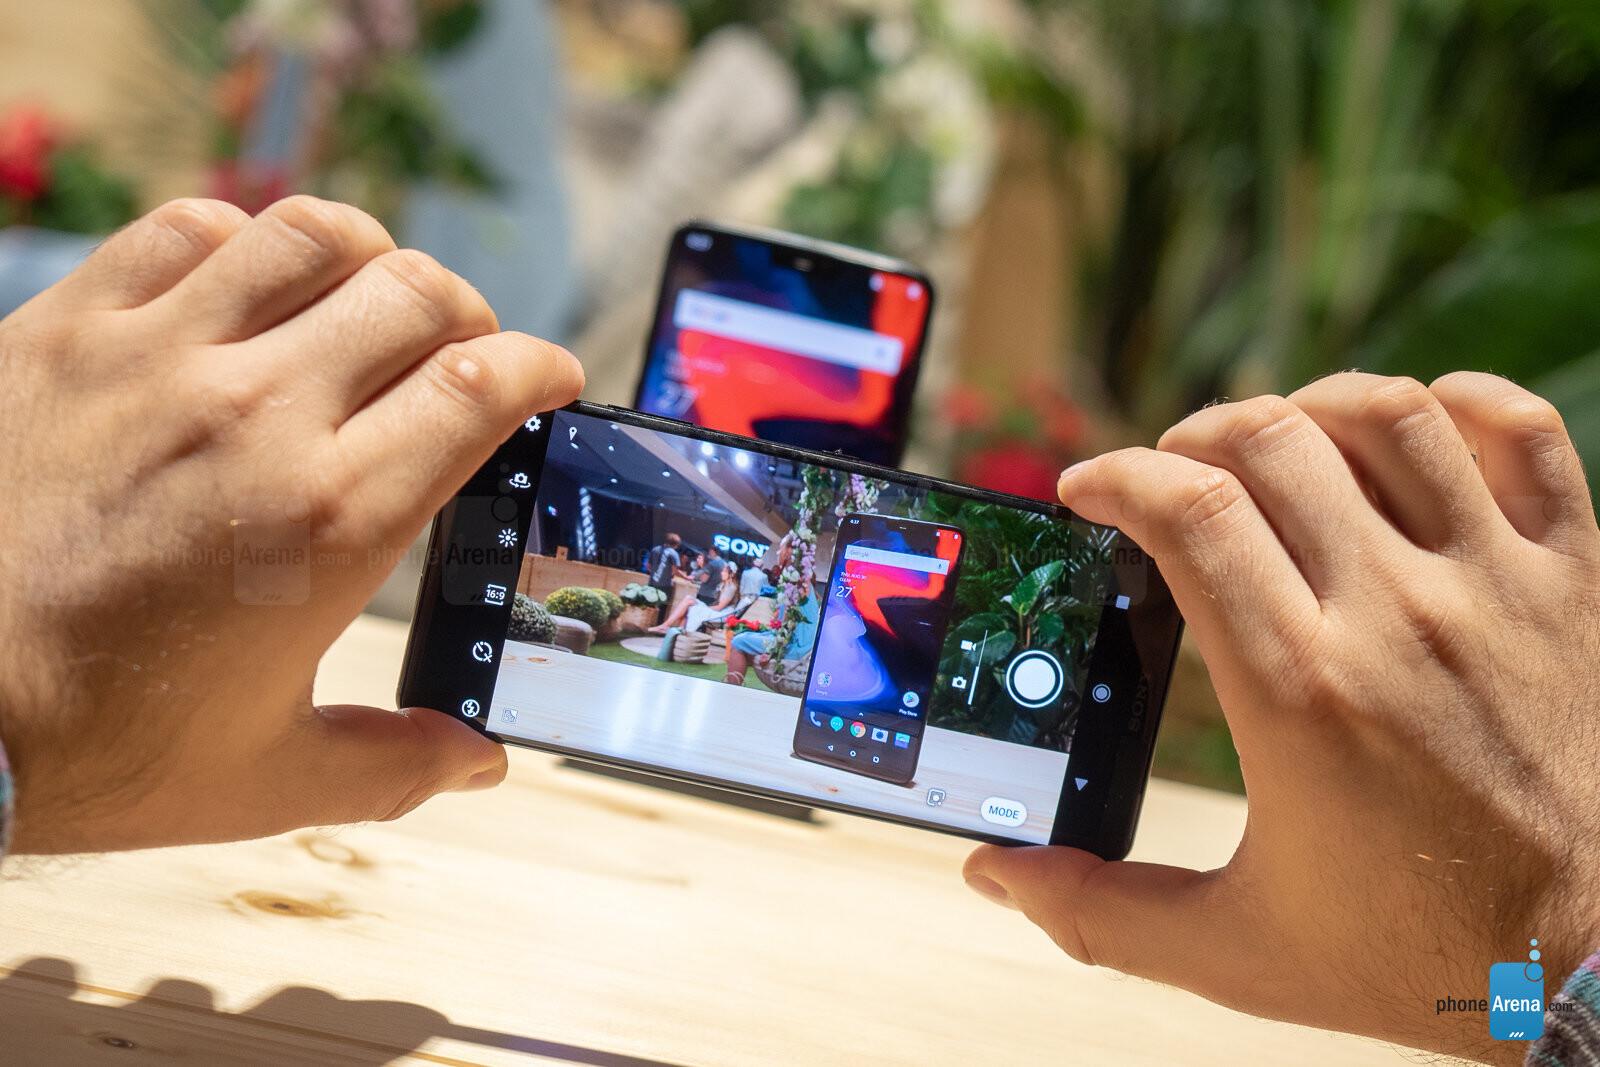 Sony Xperia XZ3 vs OnePlus 6: one is twice the price, so is